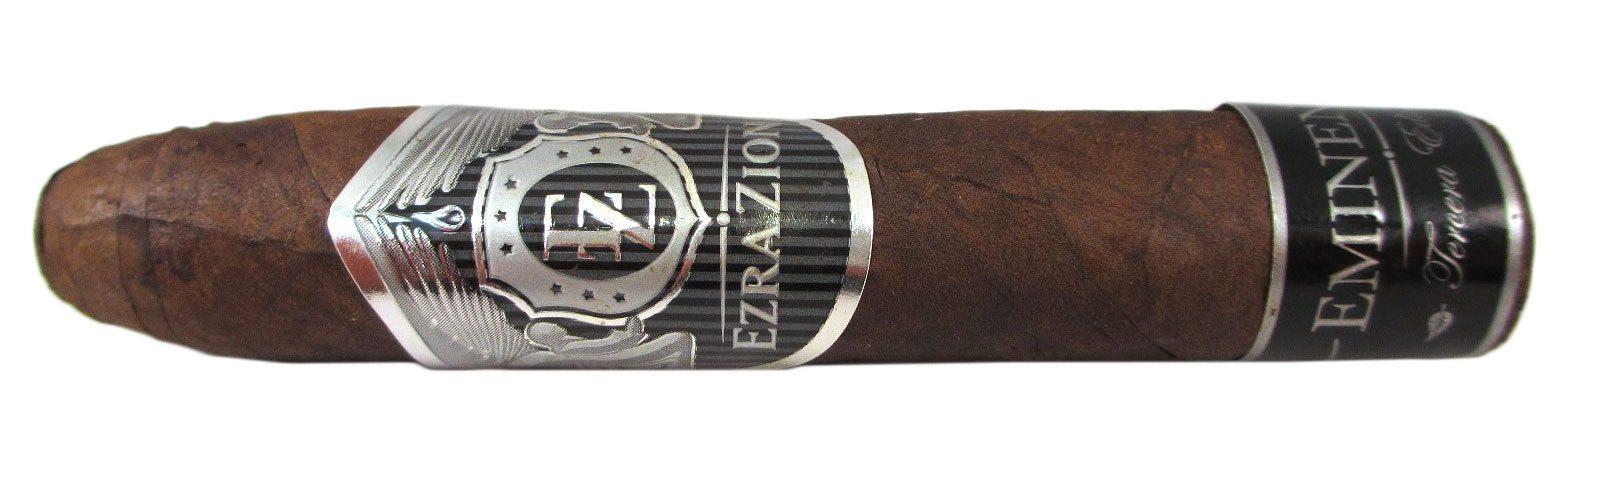 Blind Cigar Review: Ezra Zion | Eminence Belicoso Gran Toro